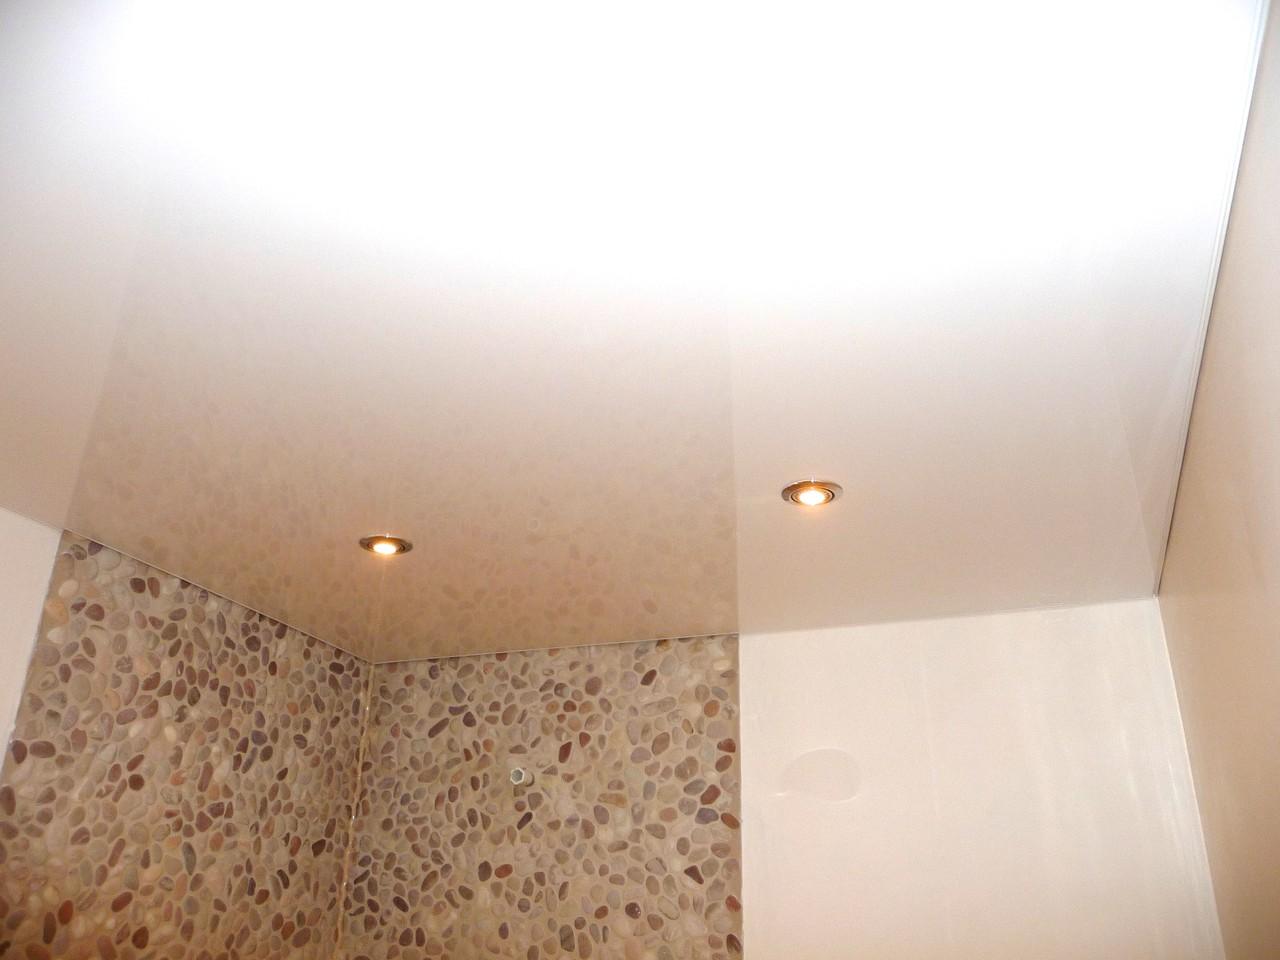 Spanndecke weiß Lack mit neuster LED Technik dimmbar!